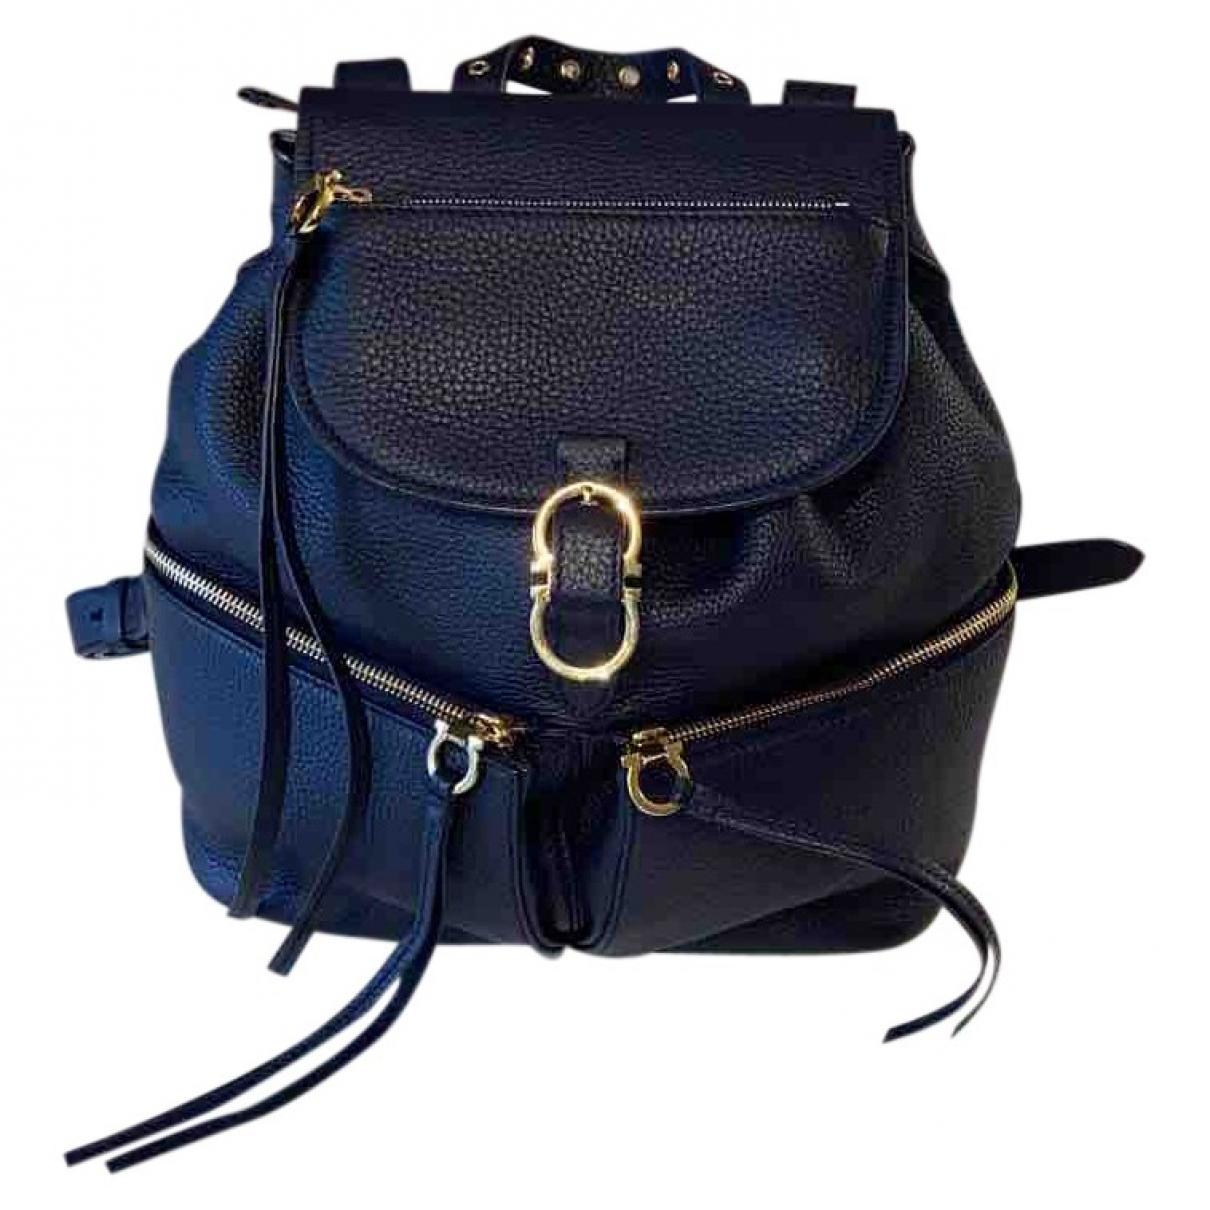 Salvatore Ferragamo \N Black Leather backpack for Women \N